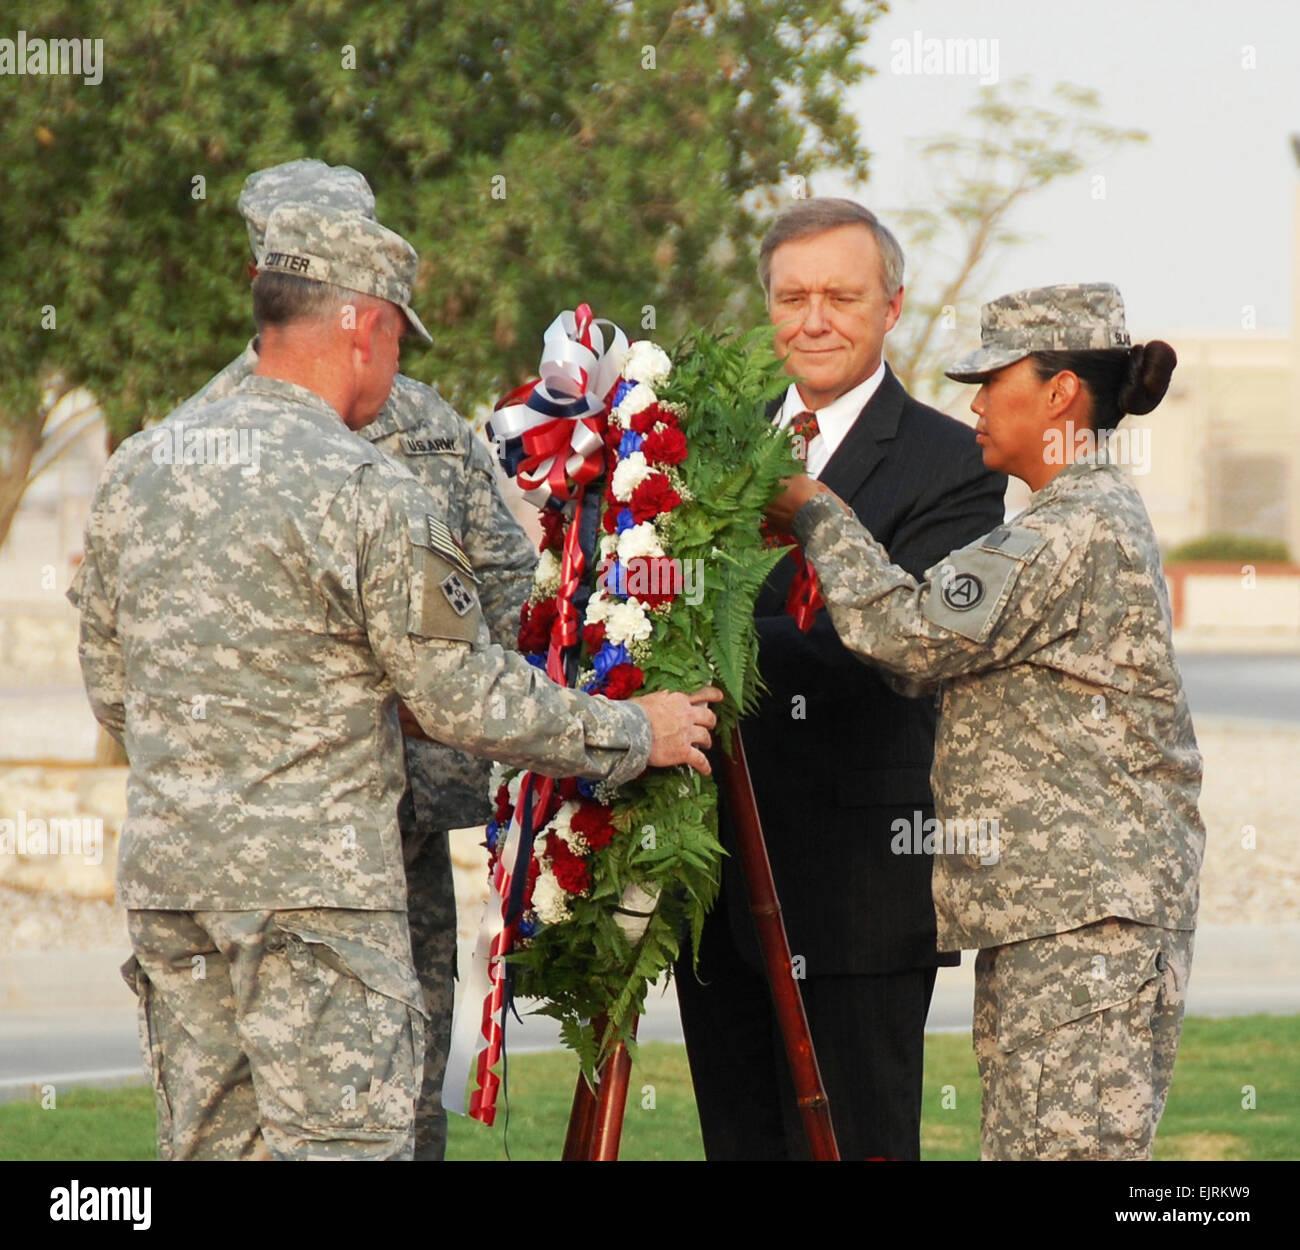 Army Chaplain Assistant Stockfotos & Army Chaplain Assistant Bilder ...